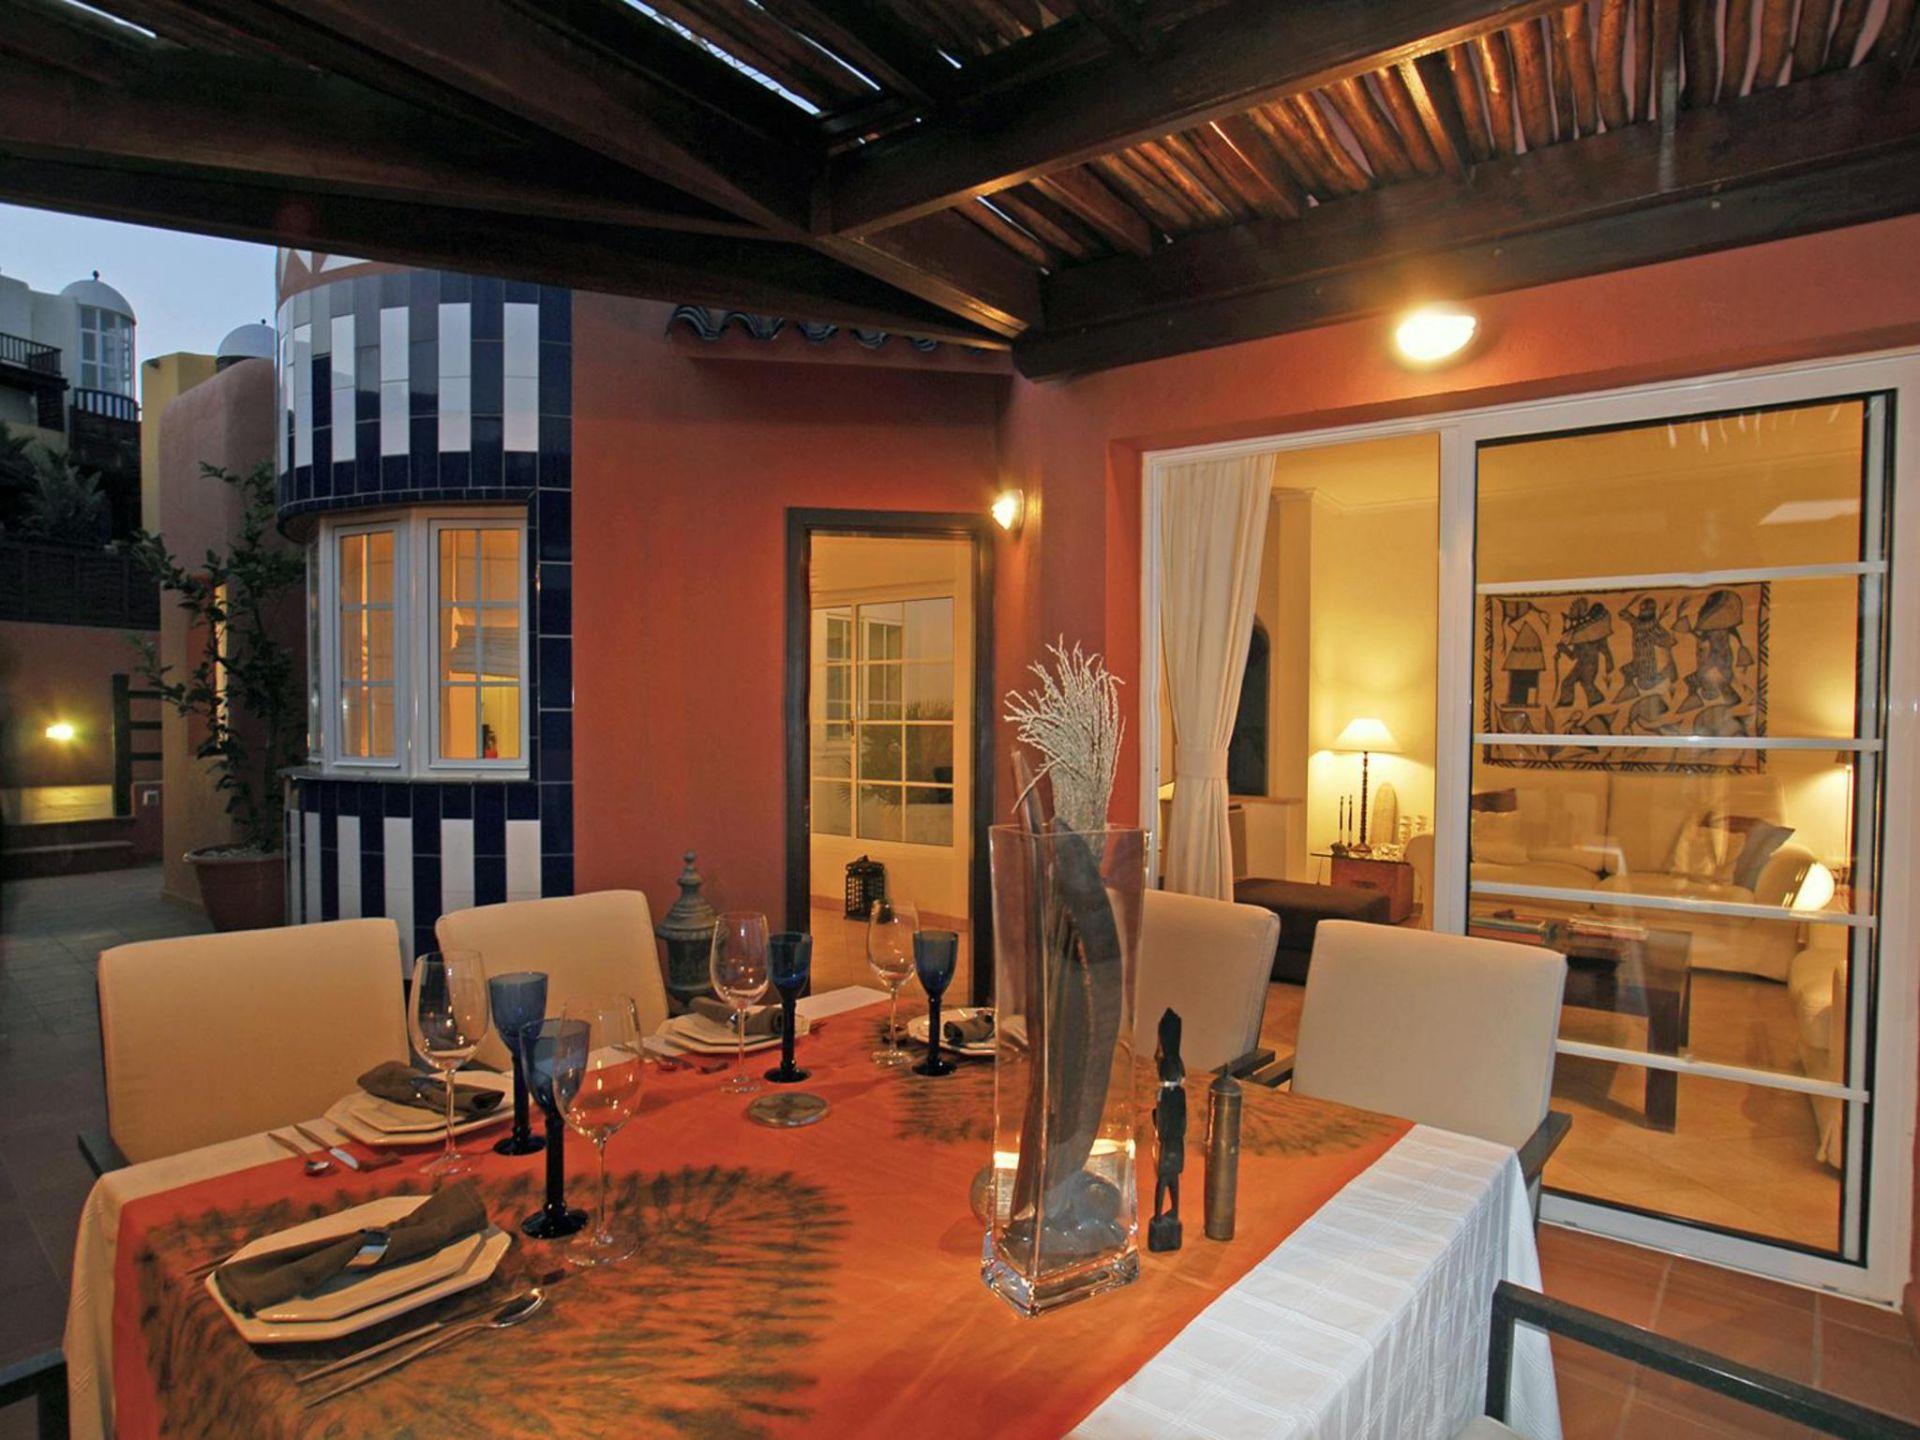 Holiday apartment Villa San Agustin 10 - Holiday Rental (854295), Maspalomas, Gran Canaria, Canary Islands, Spain, picture 34